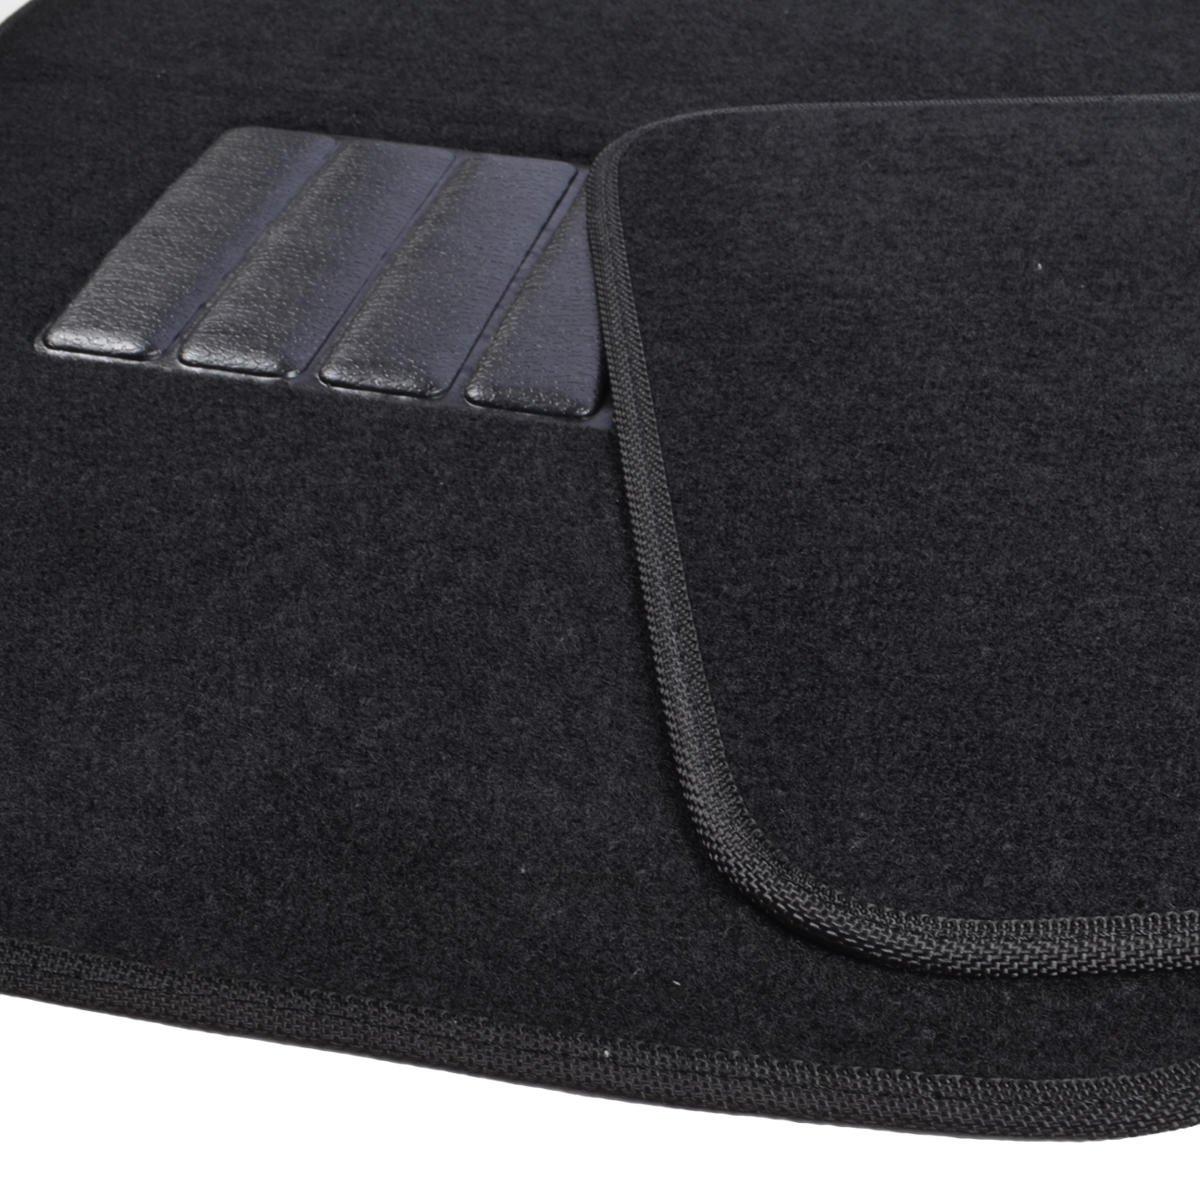 Amazon com bdk classic carpet floor mats for car auto universal fit front rear with heelpad black automotive